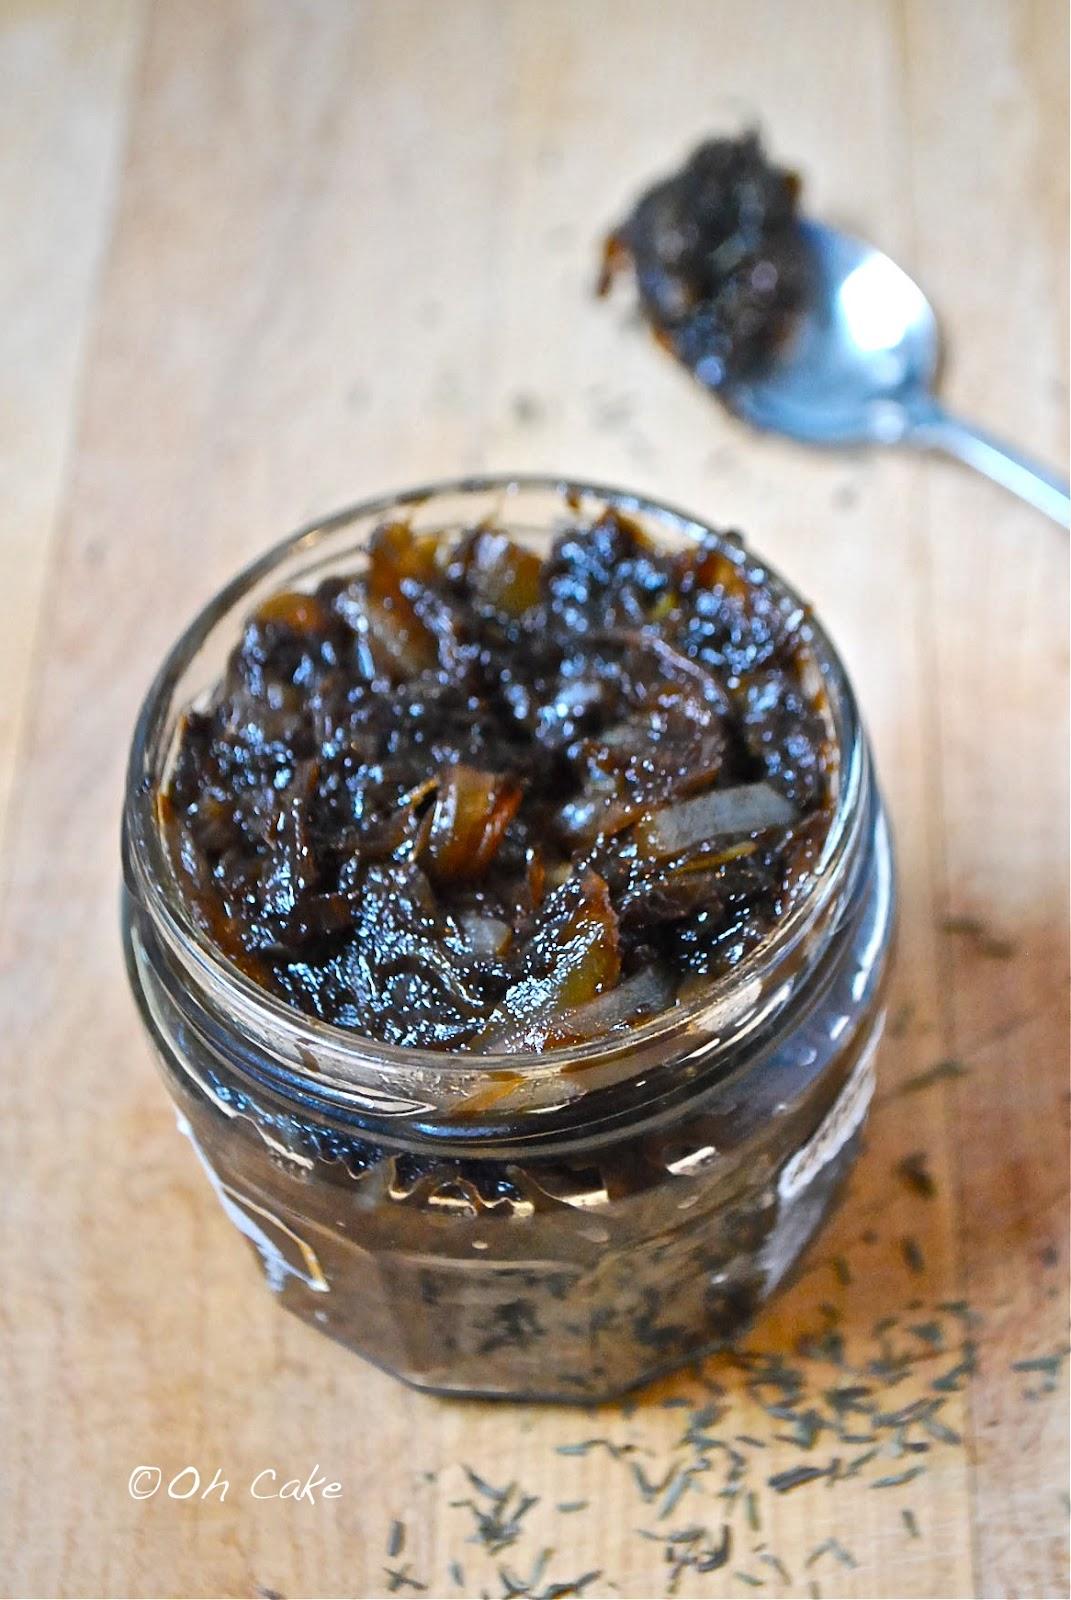 Oh Cake: Balsamic Onion Jam